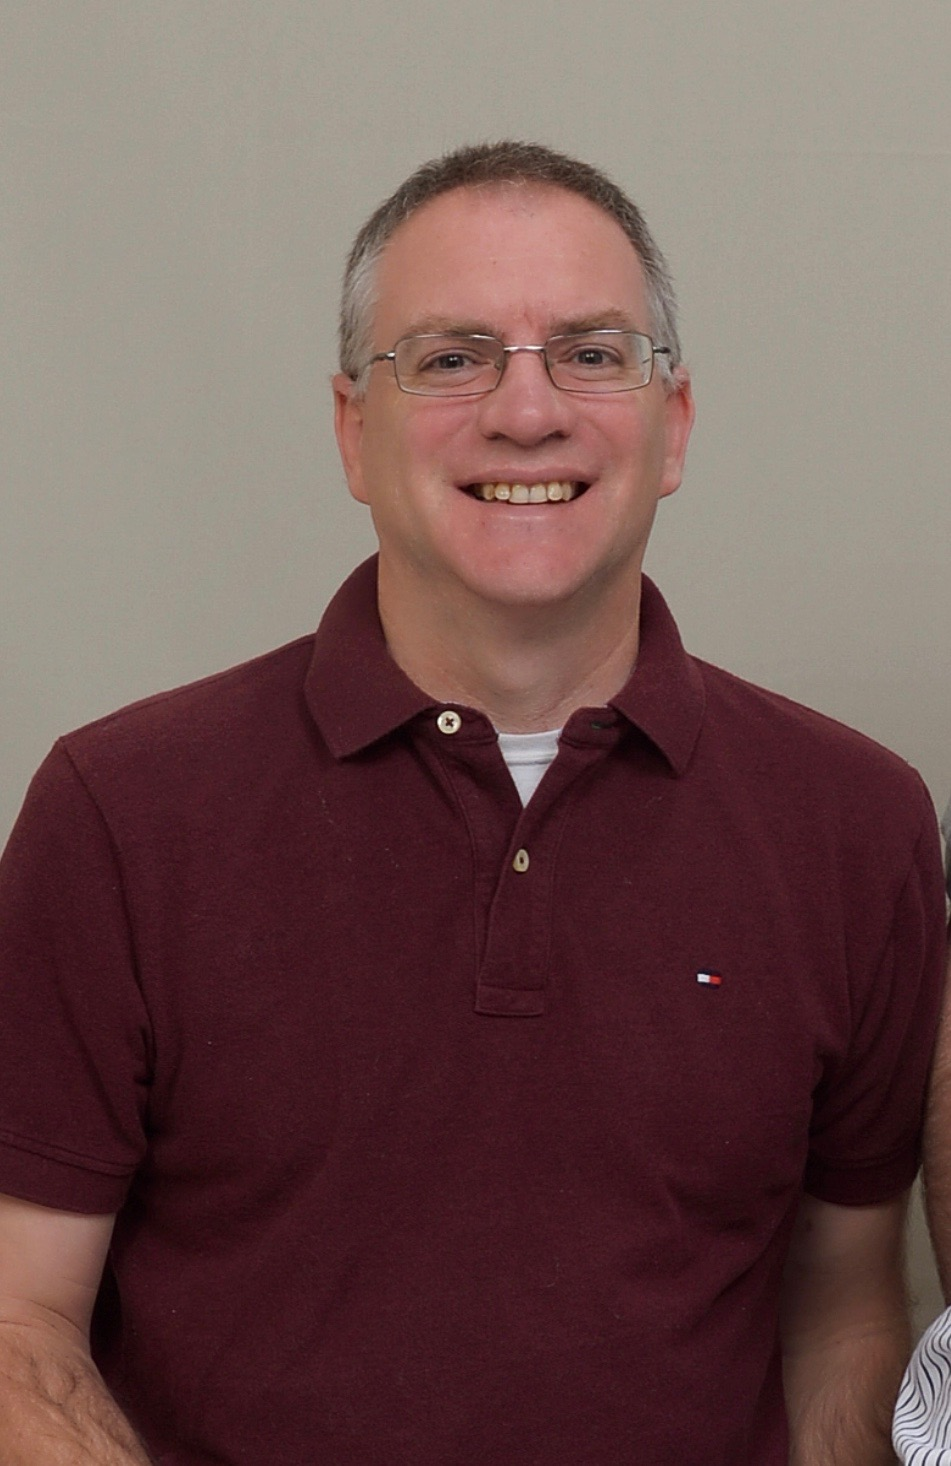 Todd Allen Smith